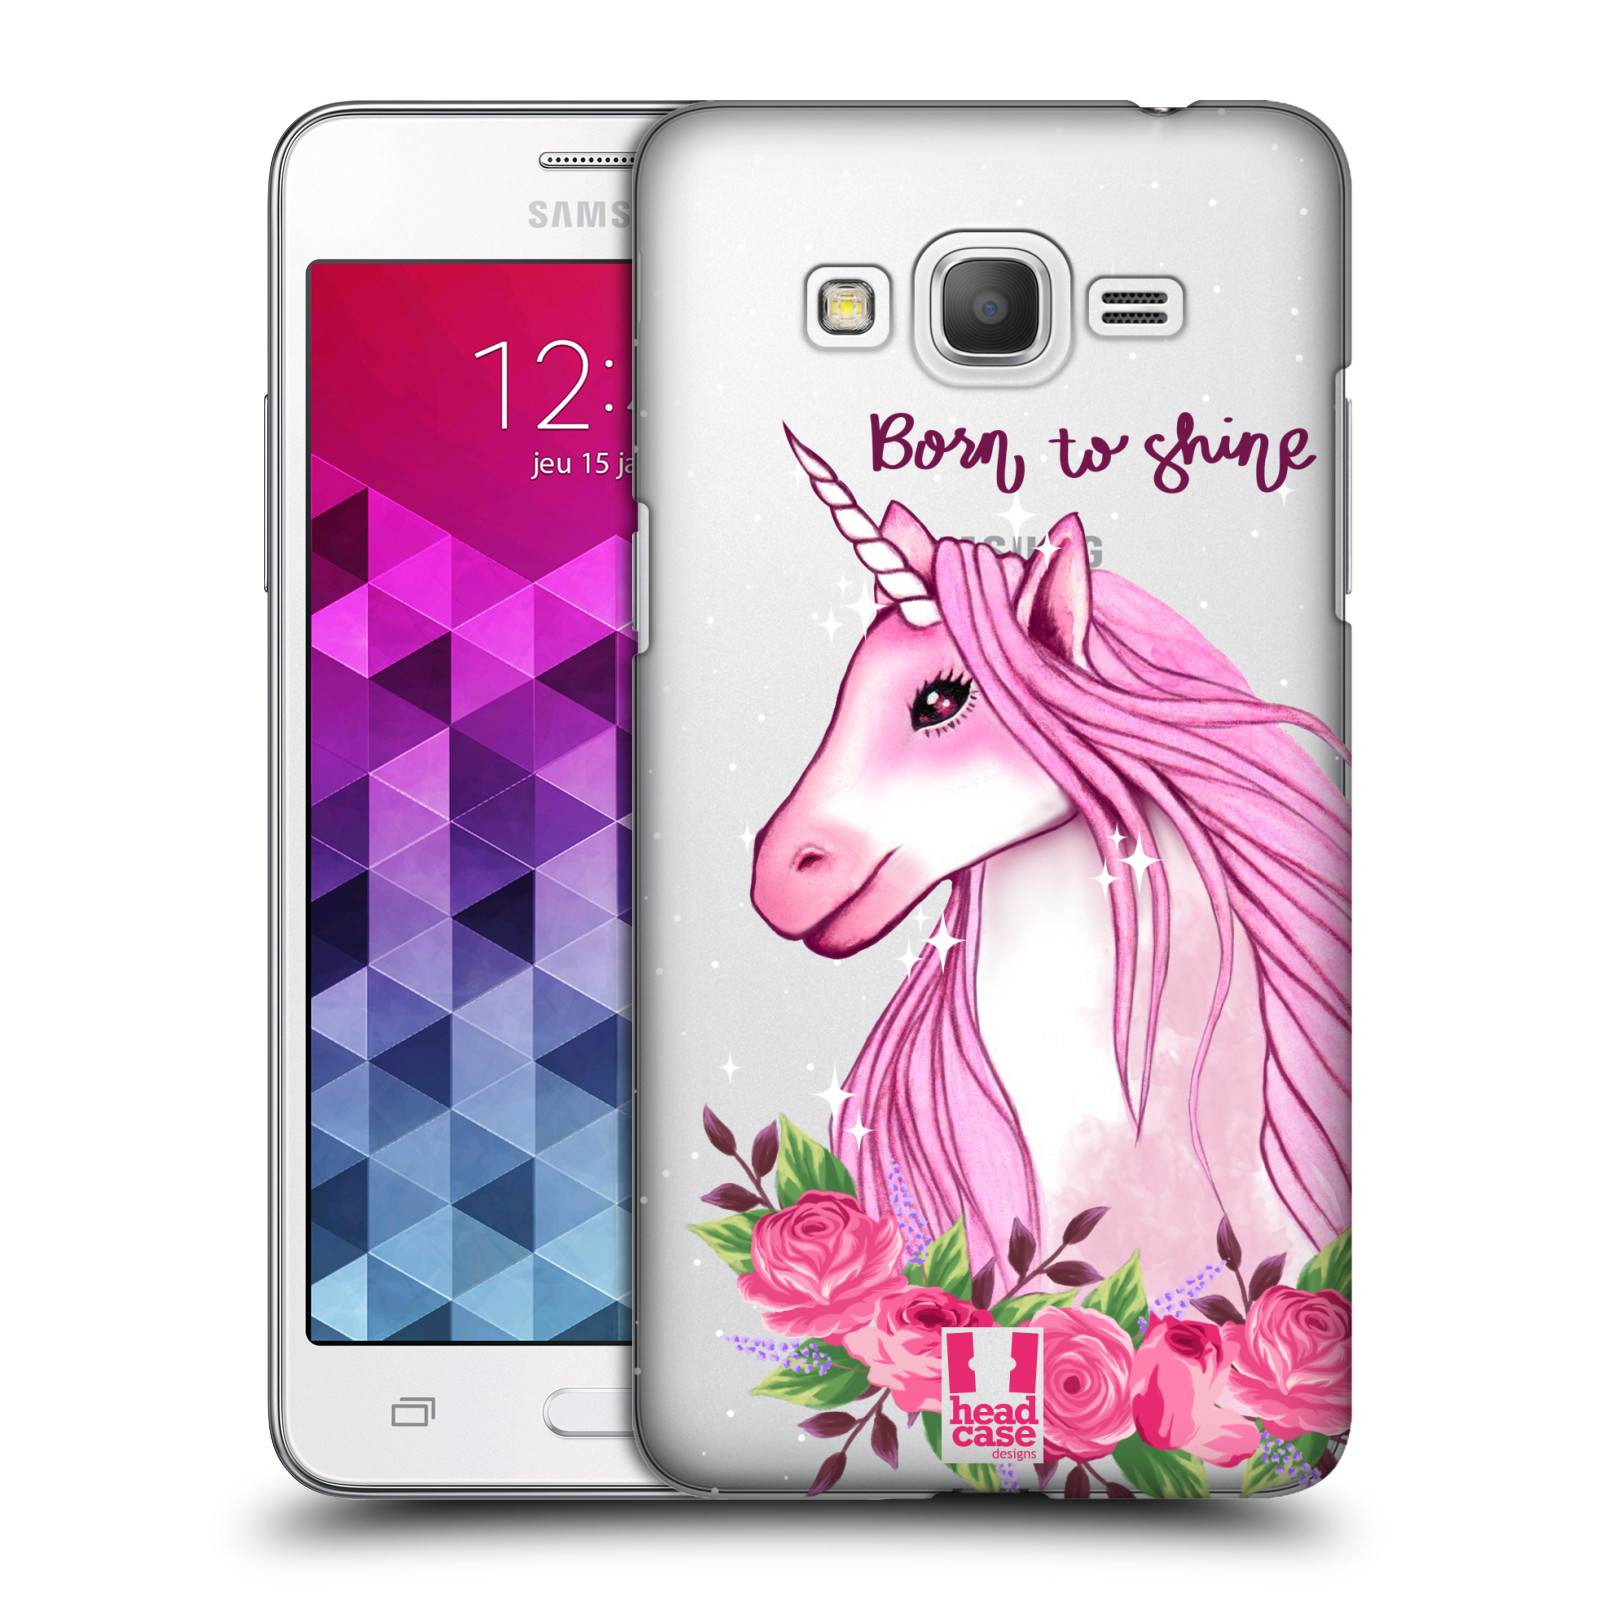 Plastové pouzdro na mobil Samsung Galaxy Grand Prime VE - Head Case - Jednorožec - Born to shine